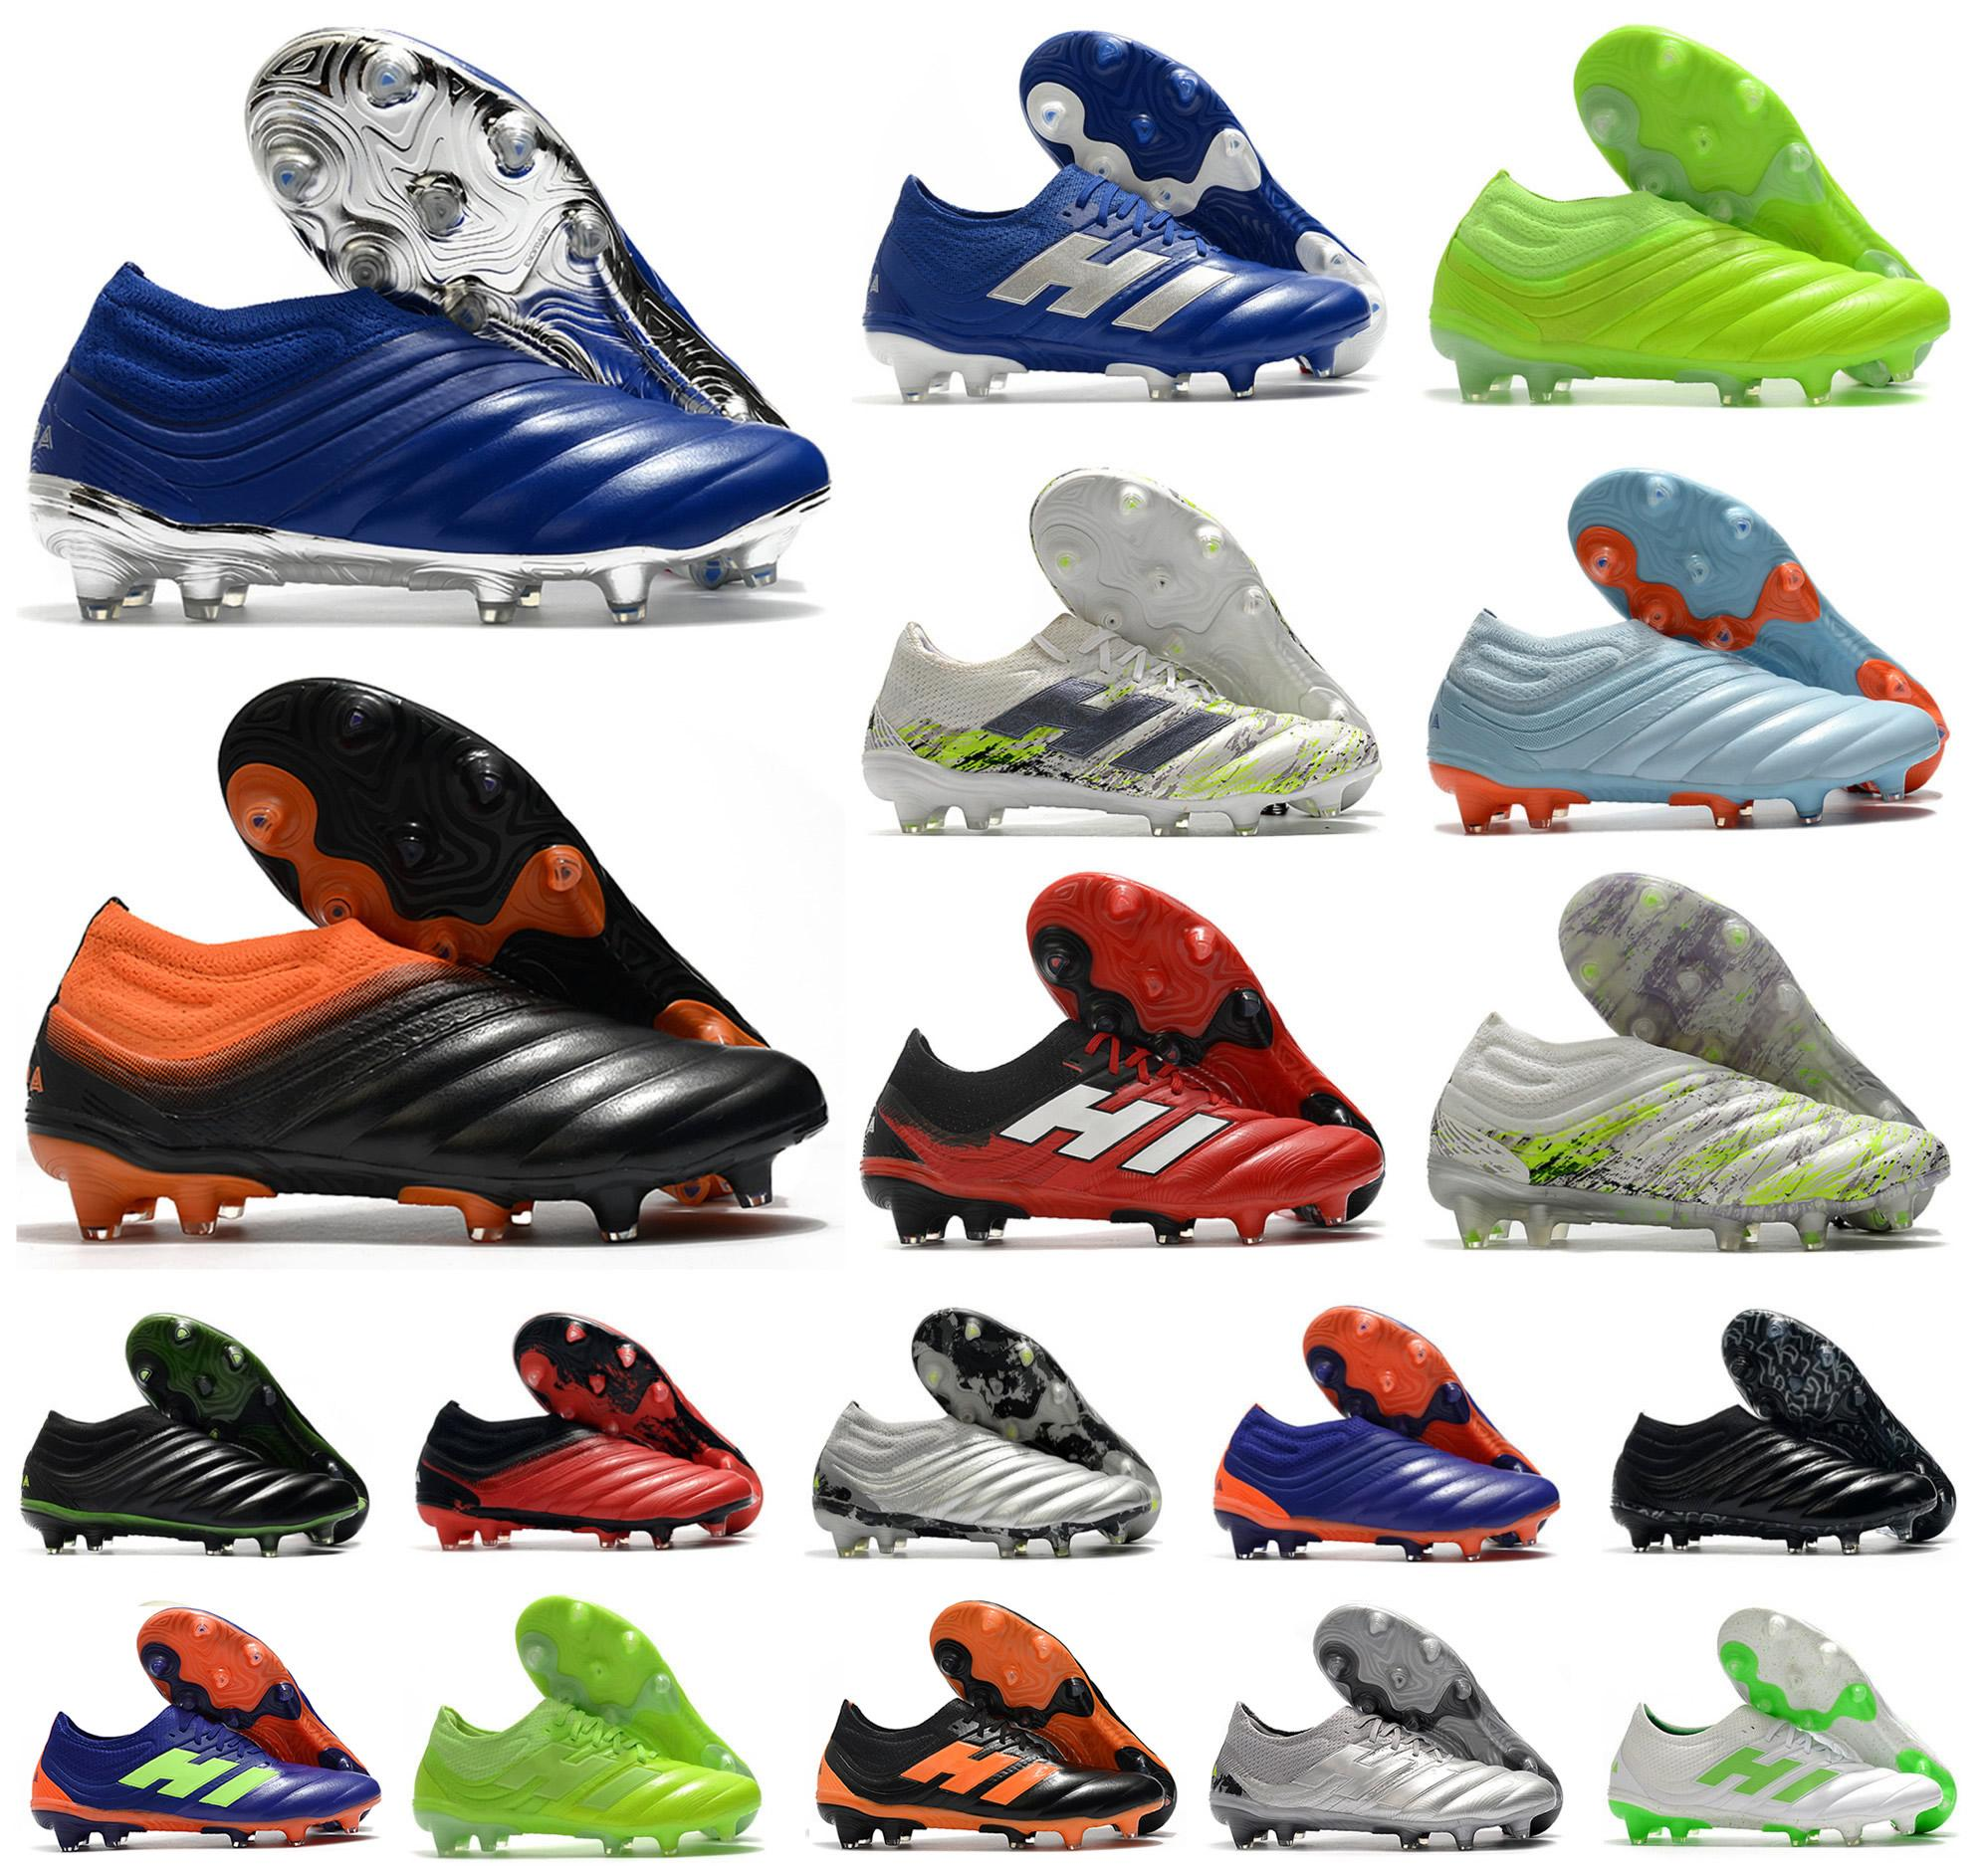 Hot Mens Copa 20+ 20.1 FG Equight Precision To Blur Glory Hunter Uniforia Slip-On 20 + X 19 + X Soccer Football أحذية الأحذية المرابط US6.5-11